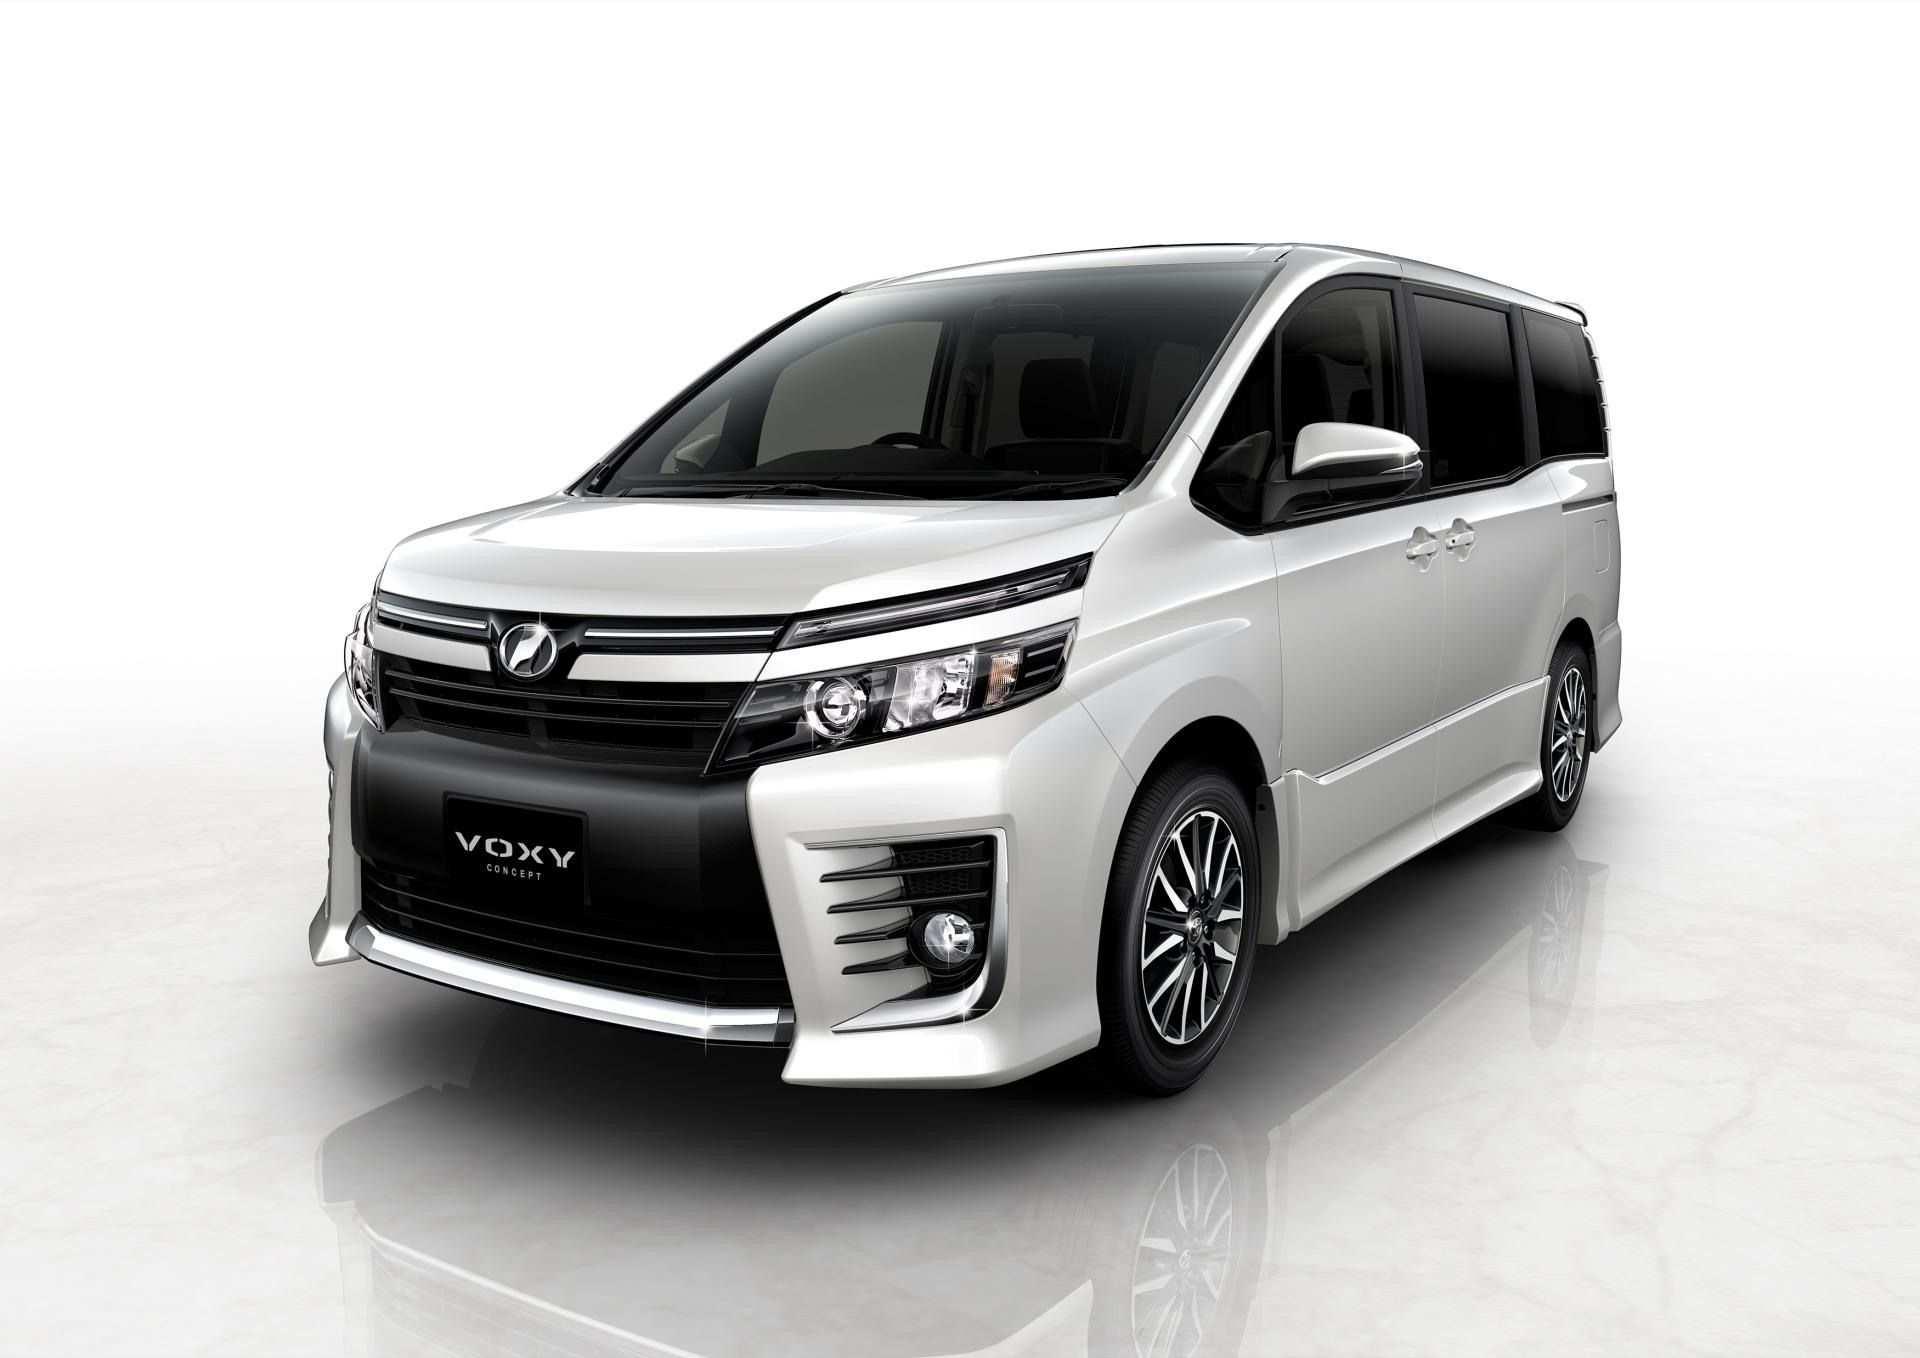 62 Great Toyota Van 2020 Research New by Toyota Van 2020